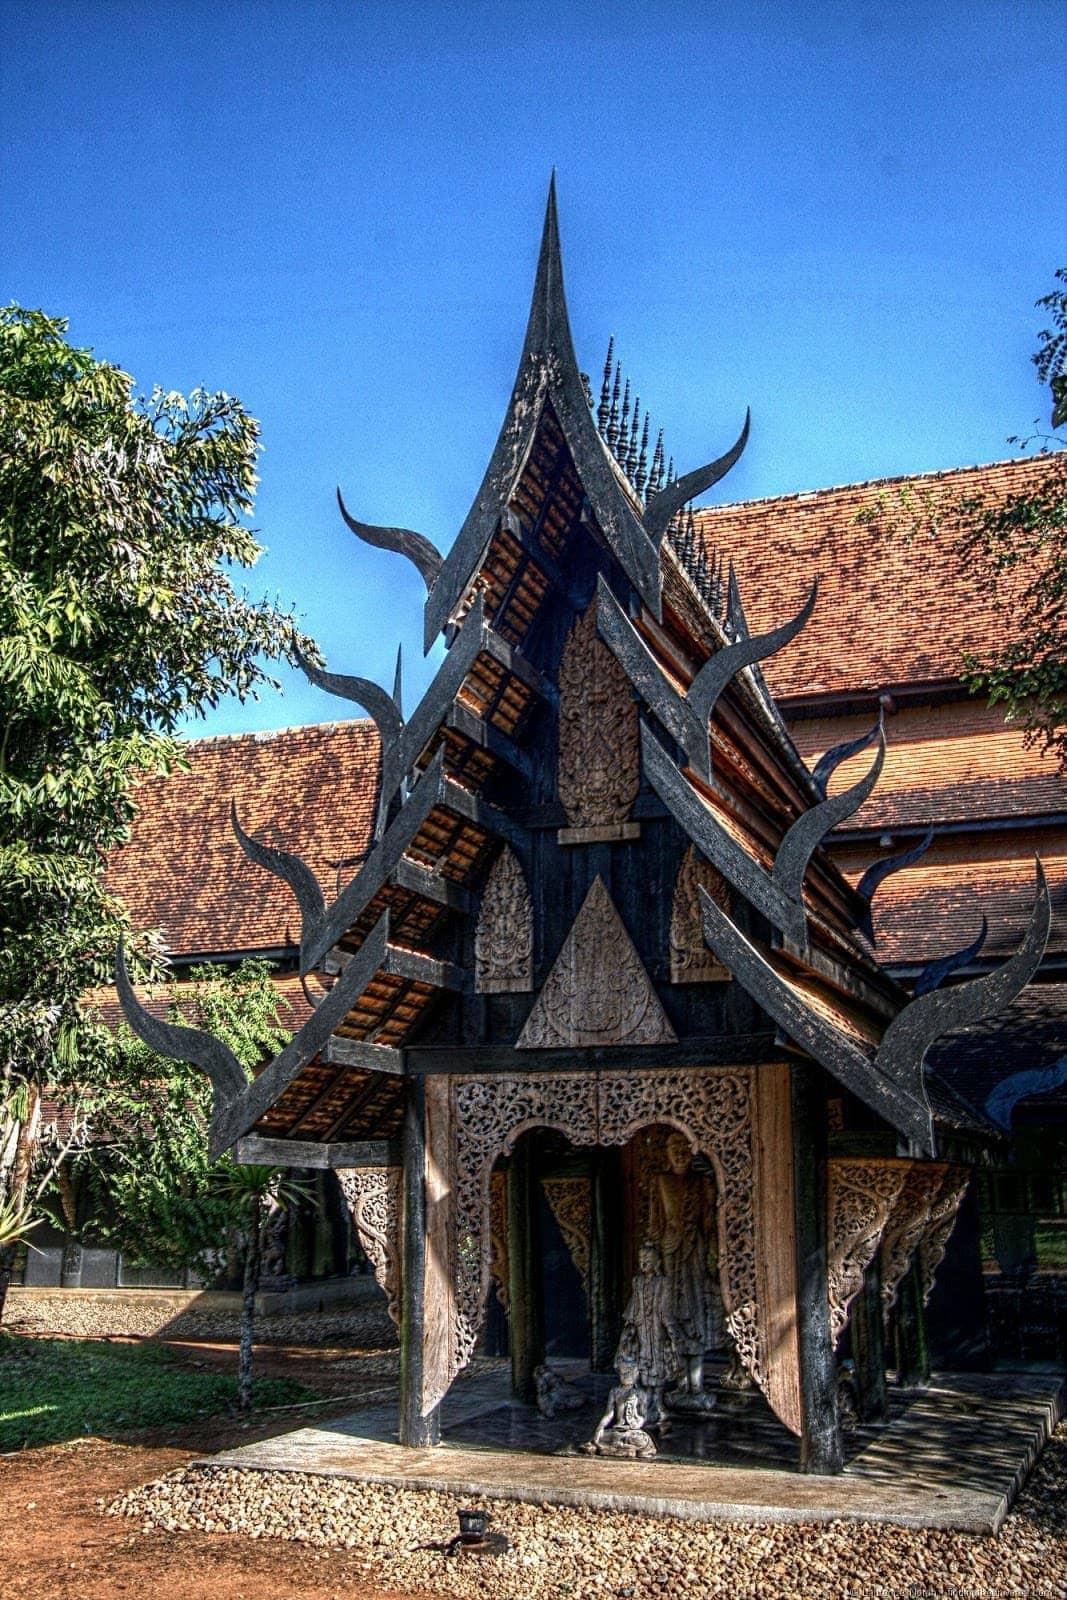 Black temple small house 2 Chiang Rai Thailand